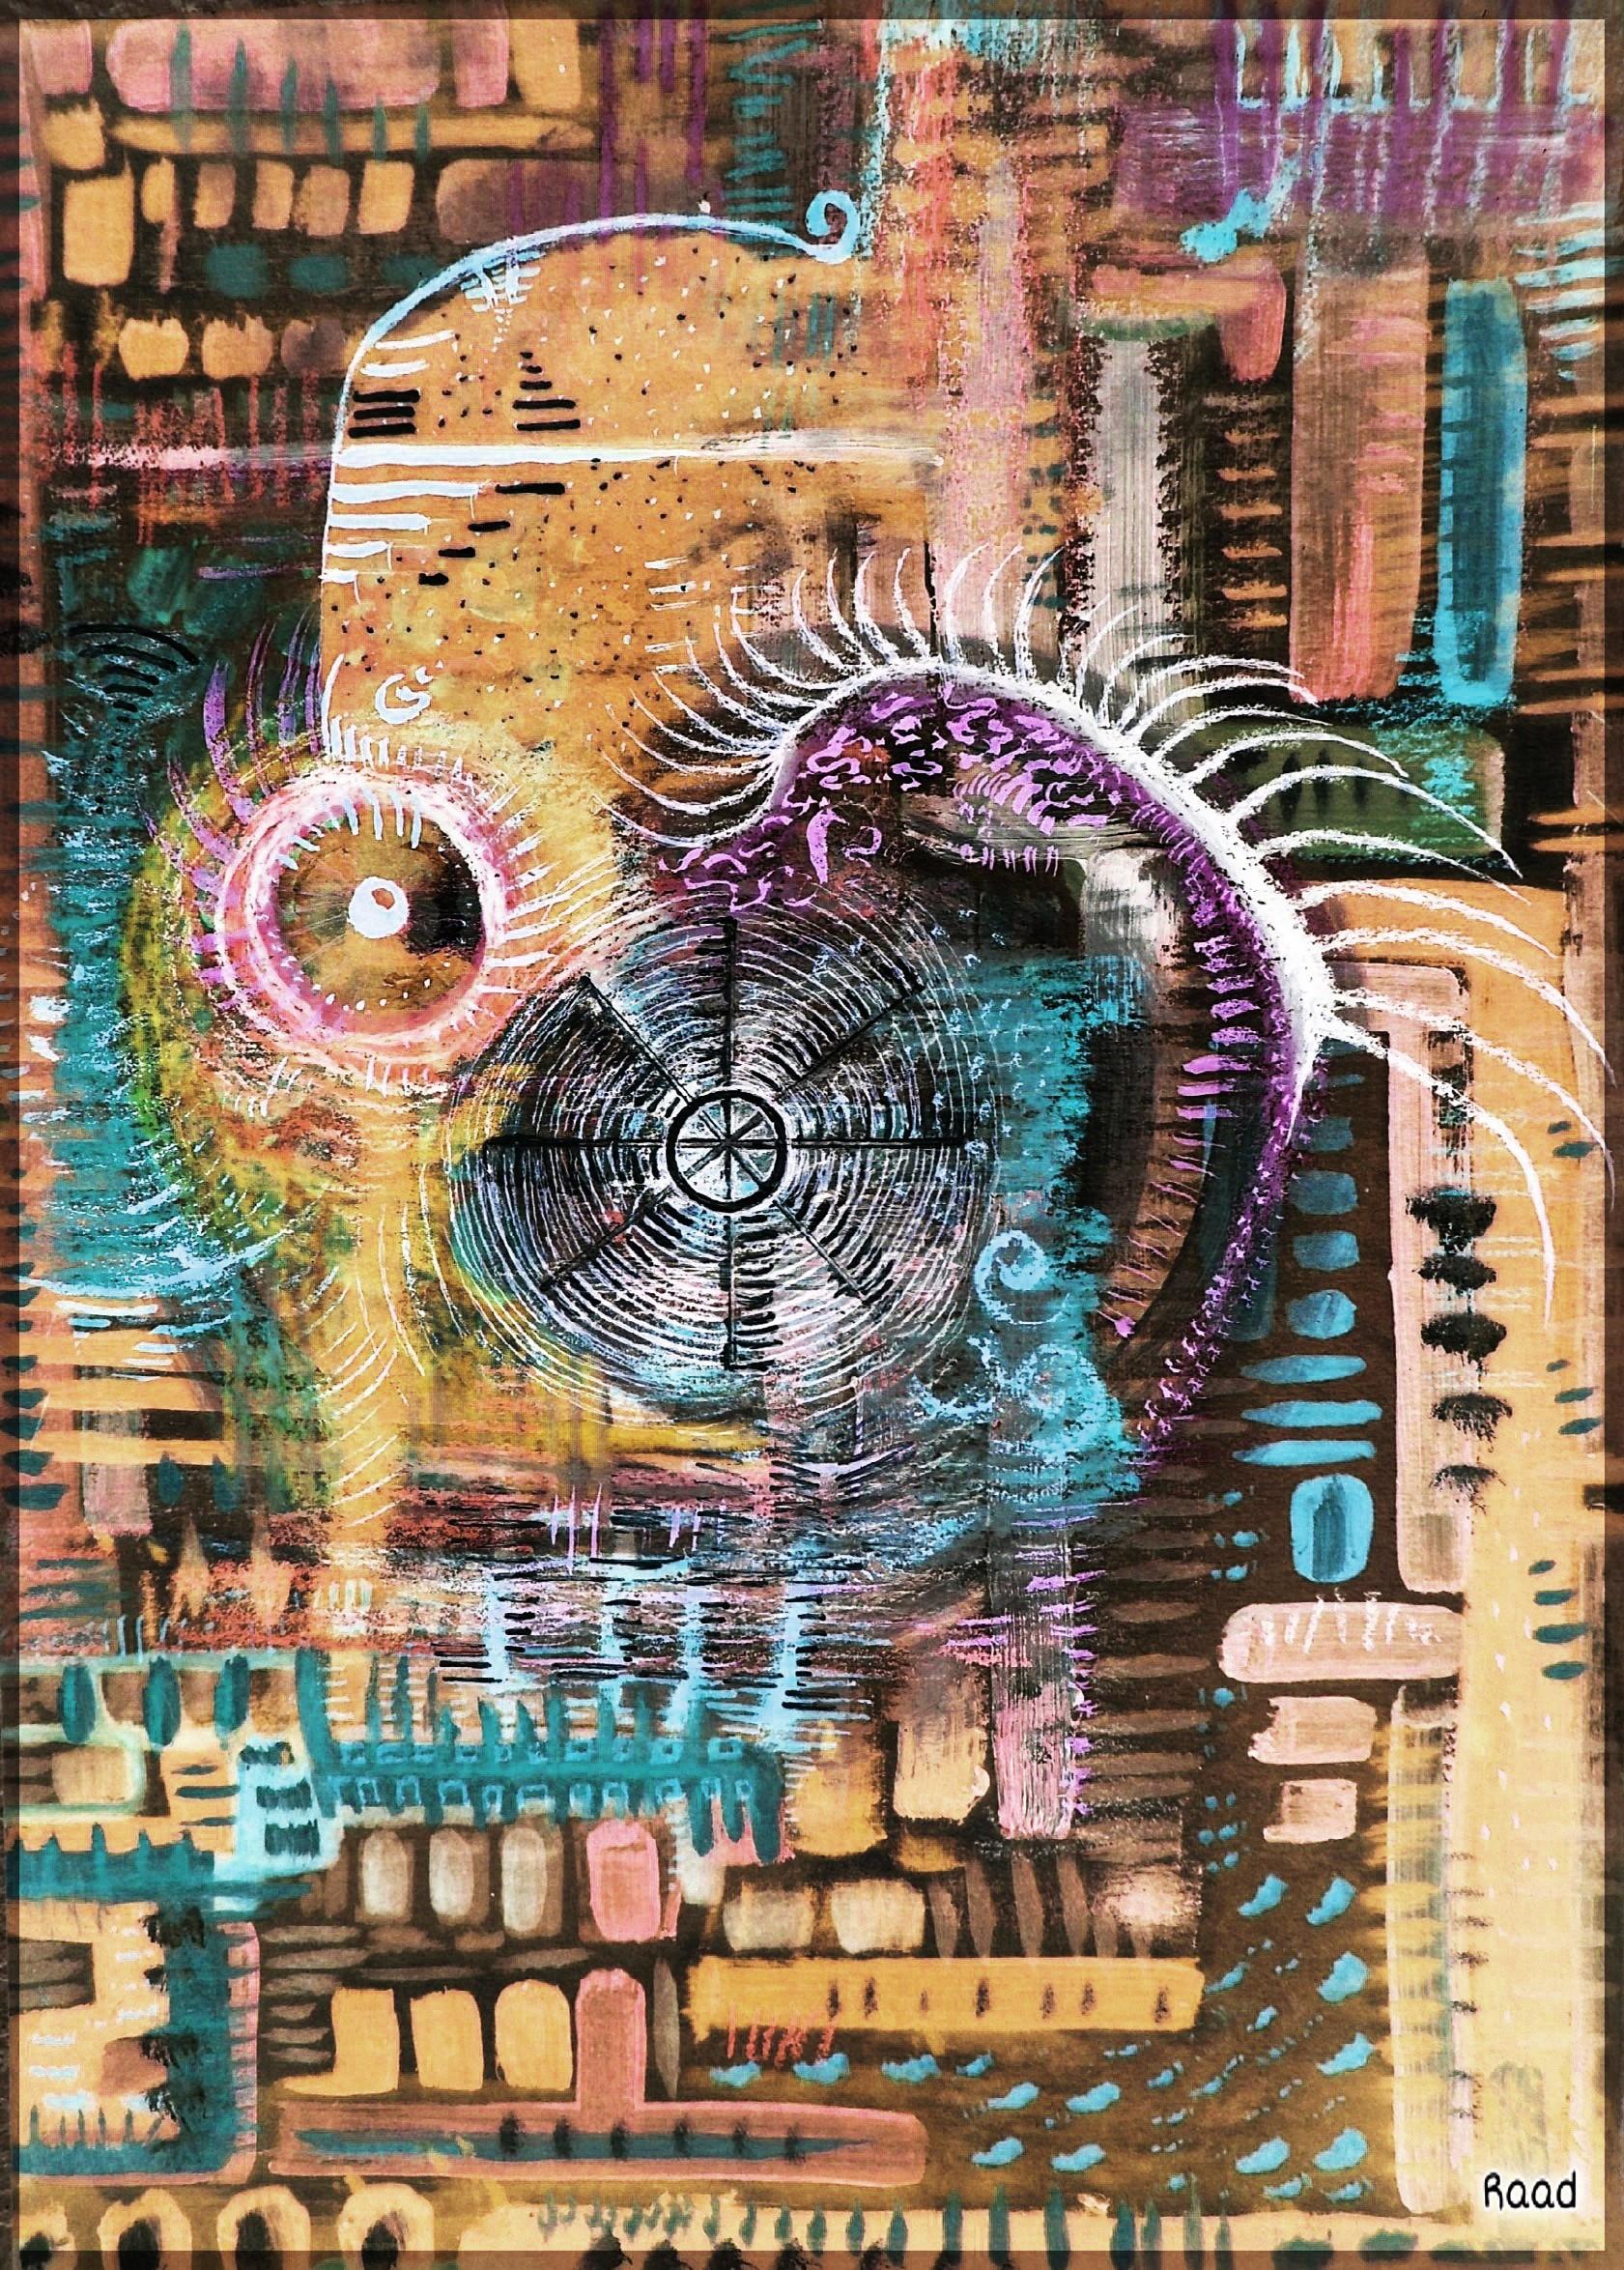 Abstract Desert Collage Art